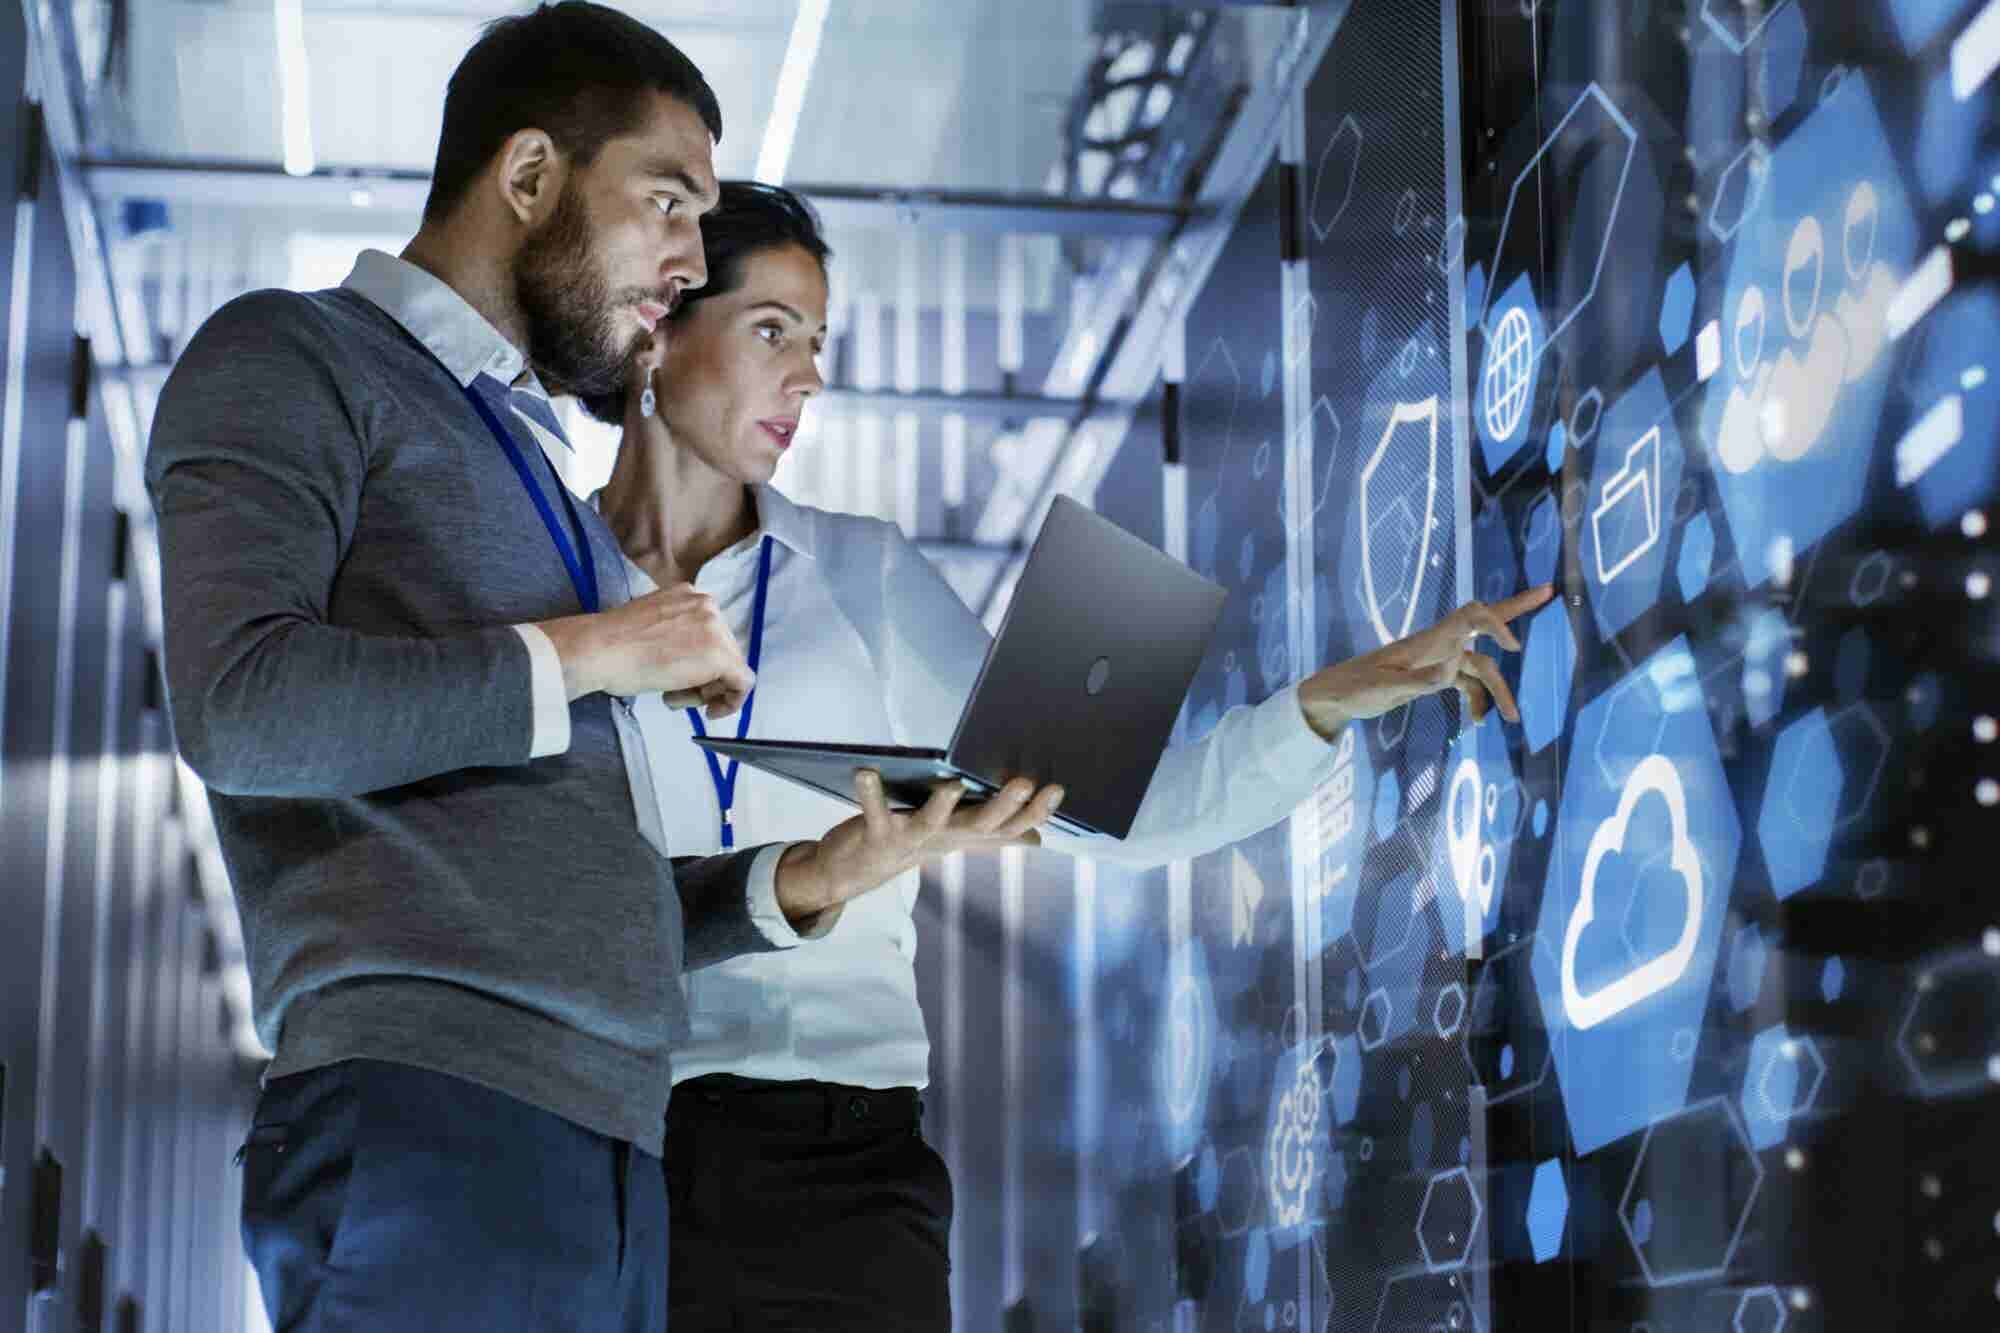 3 Ways Digital Adoption Can Make You a Better Business Leader